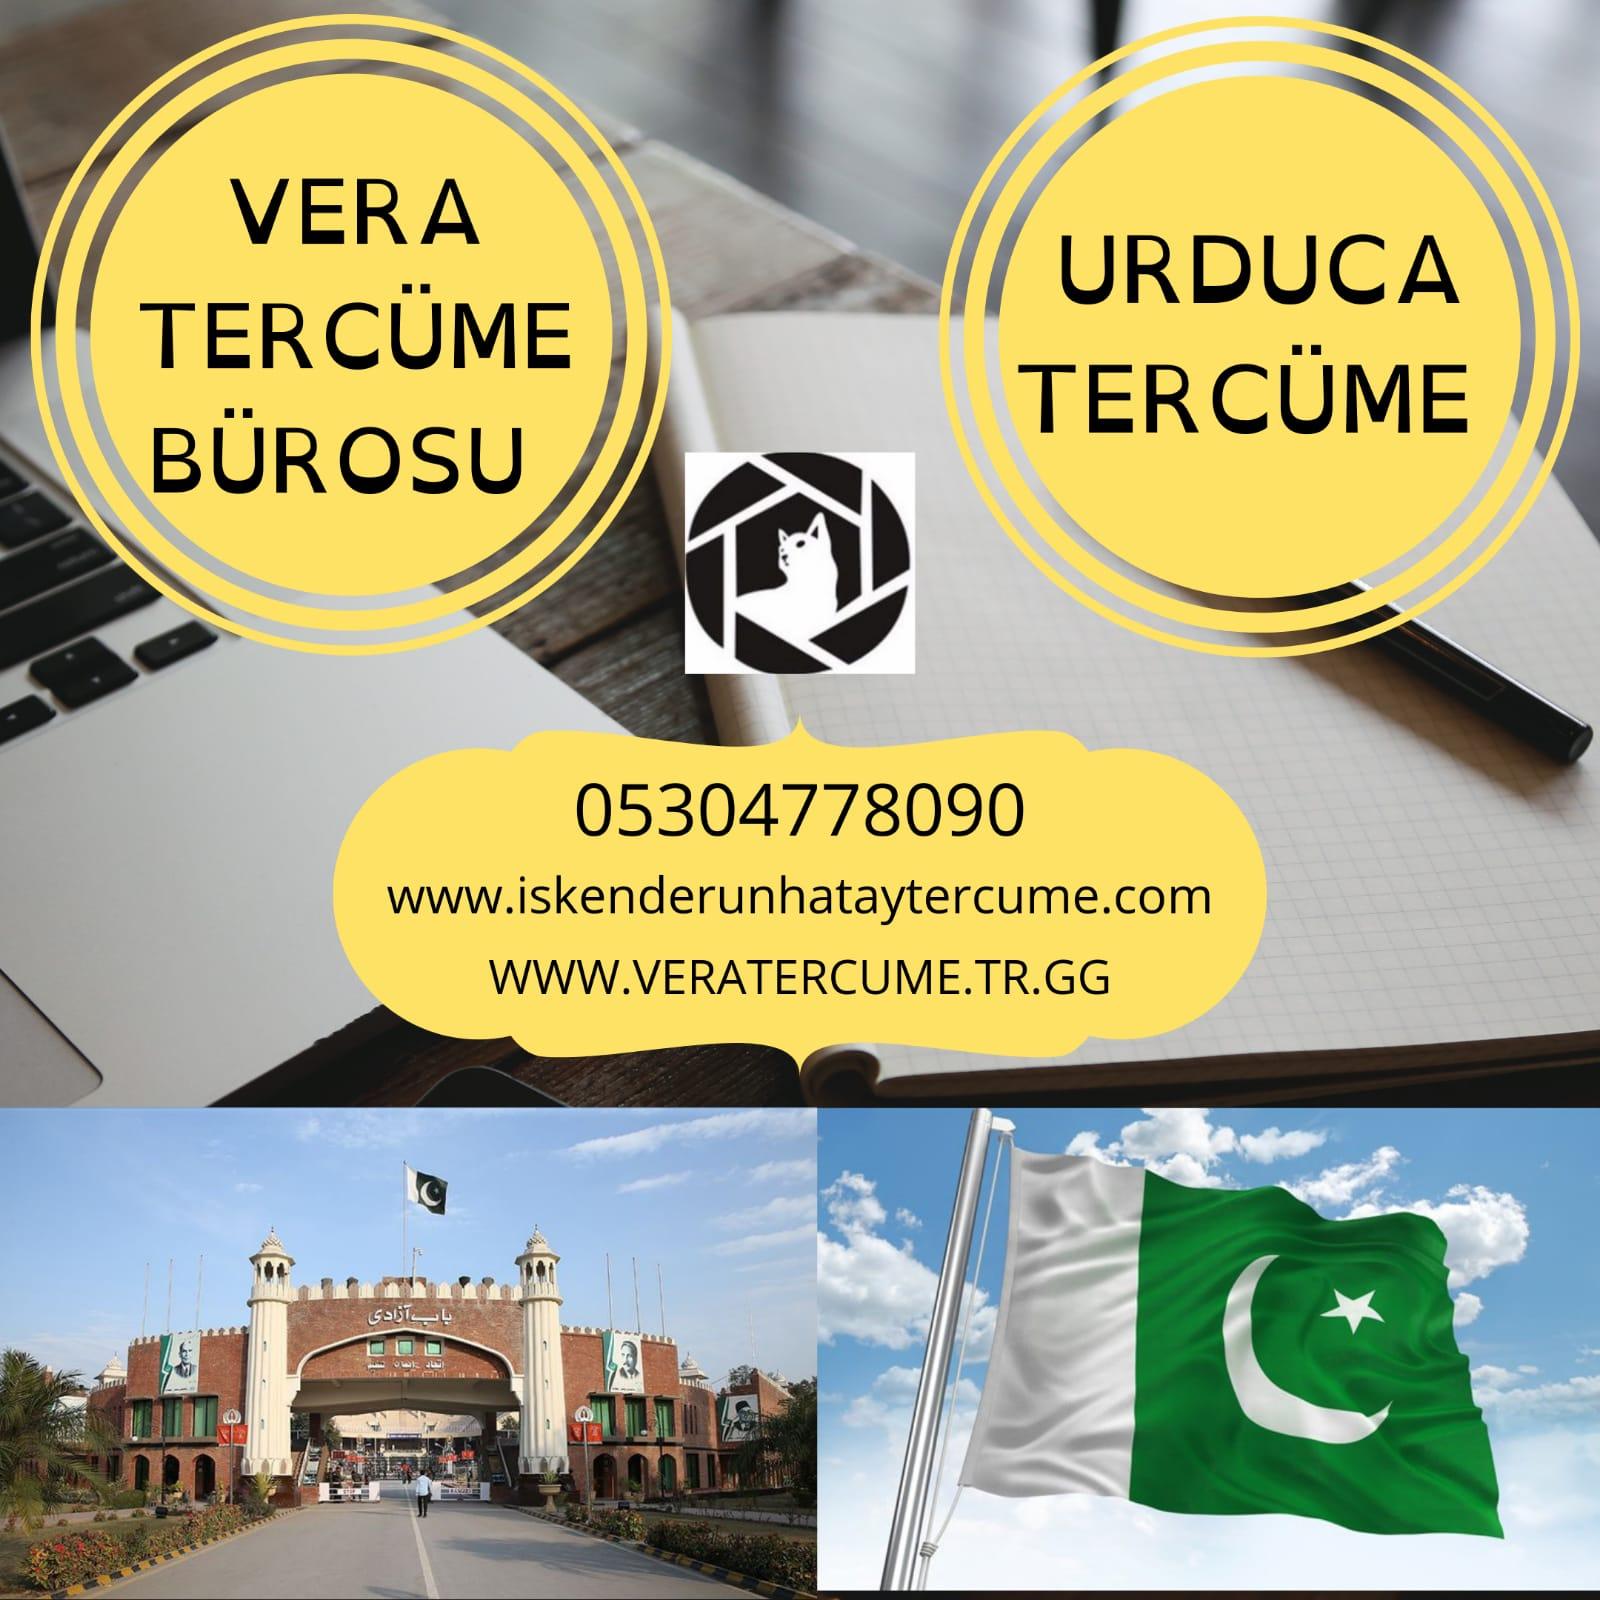 Urduca Tercüme Hizmeti